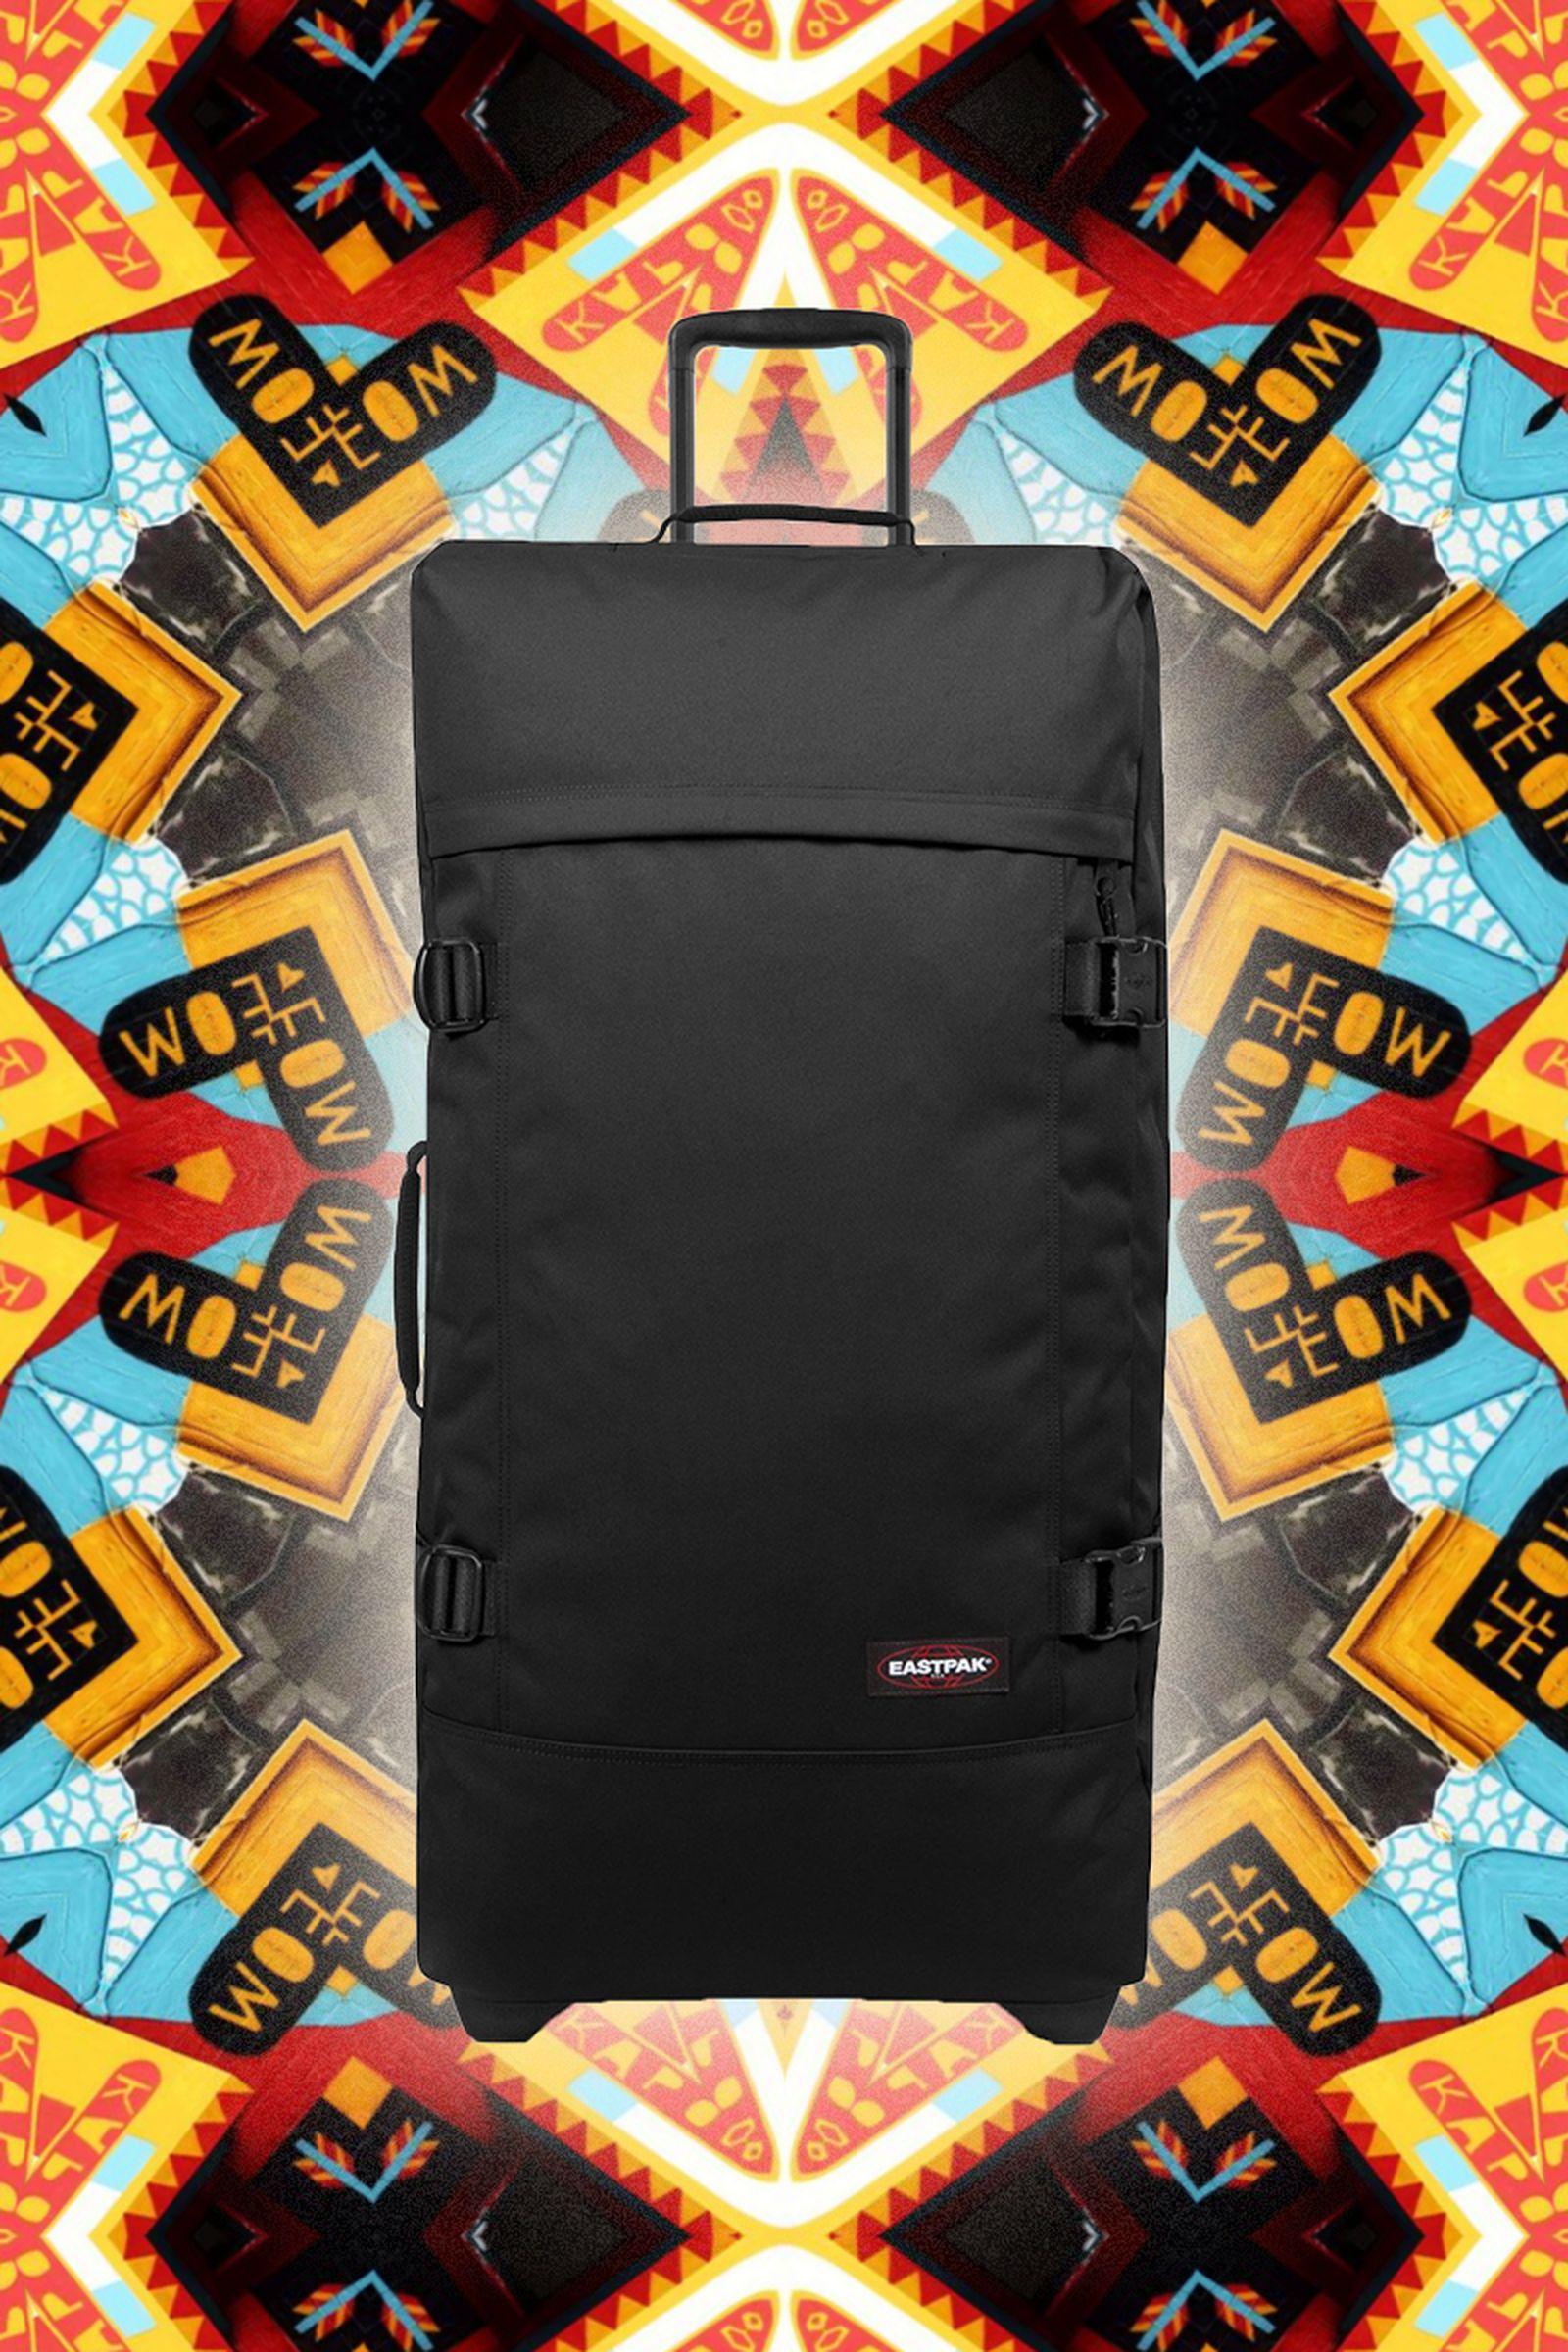 best bags for men Checkmate 1017 ALYX 9SM Halliburton Raf Simons